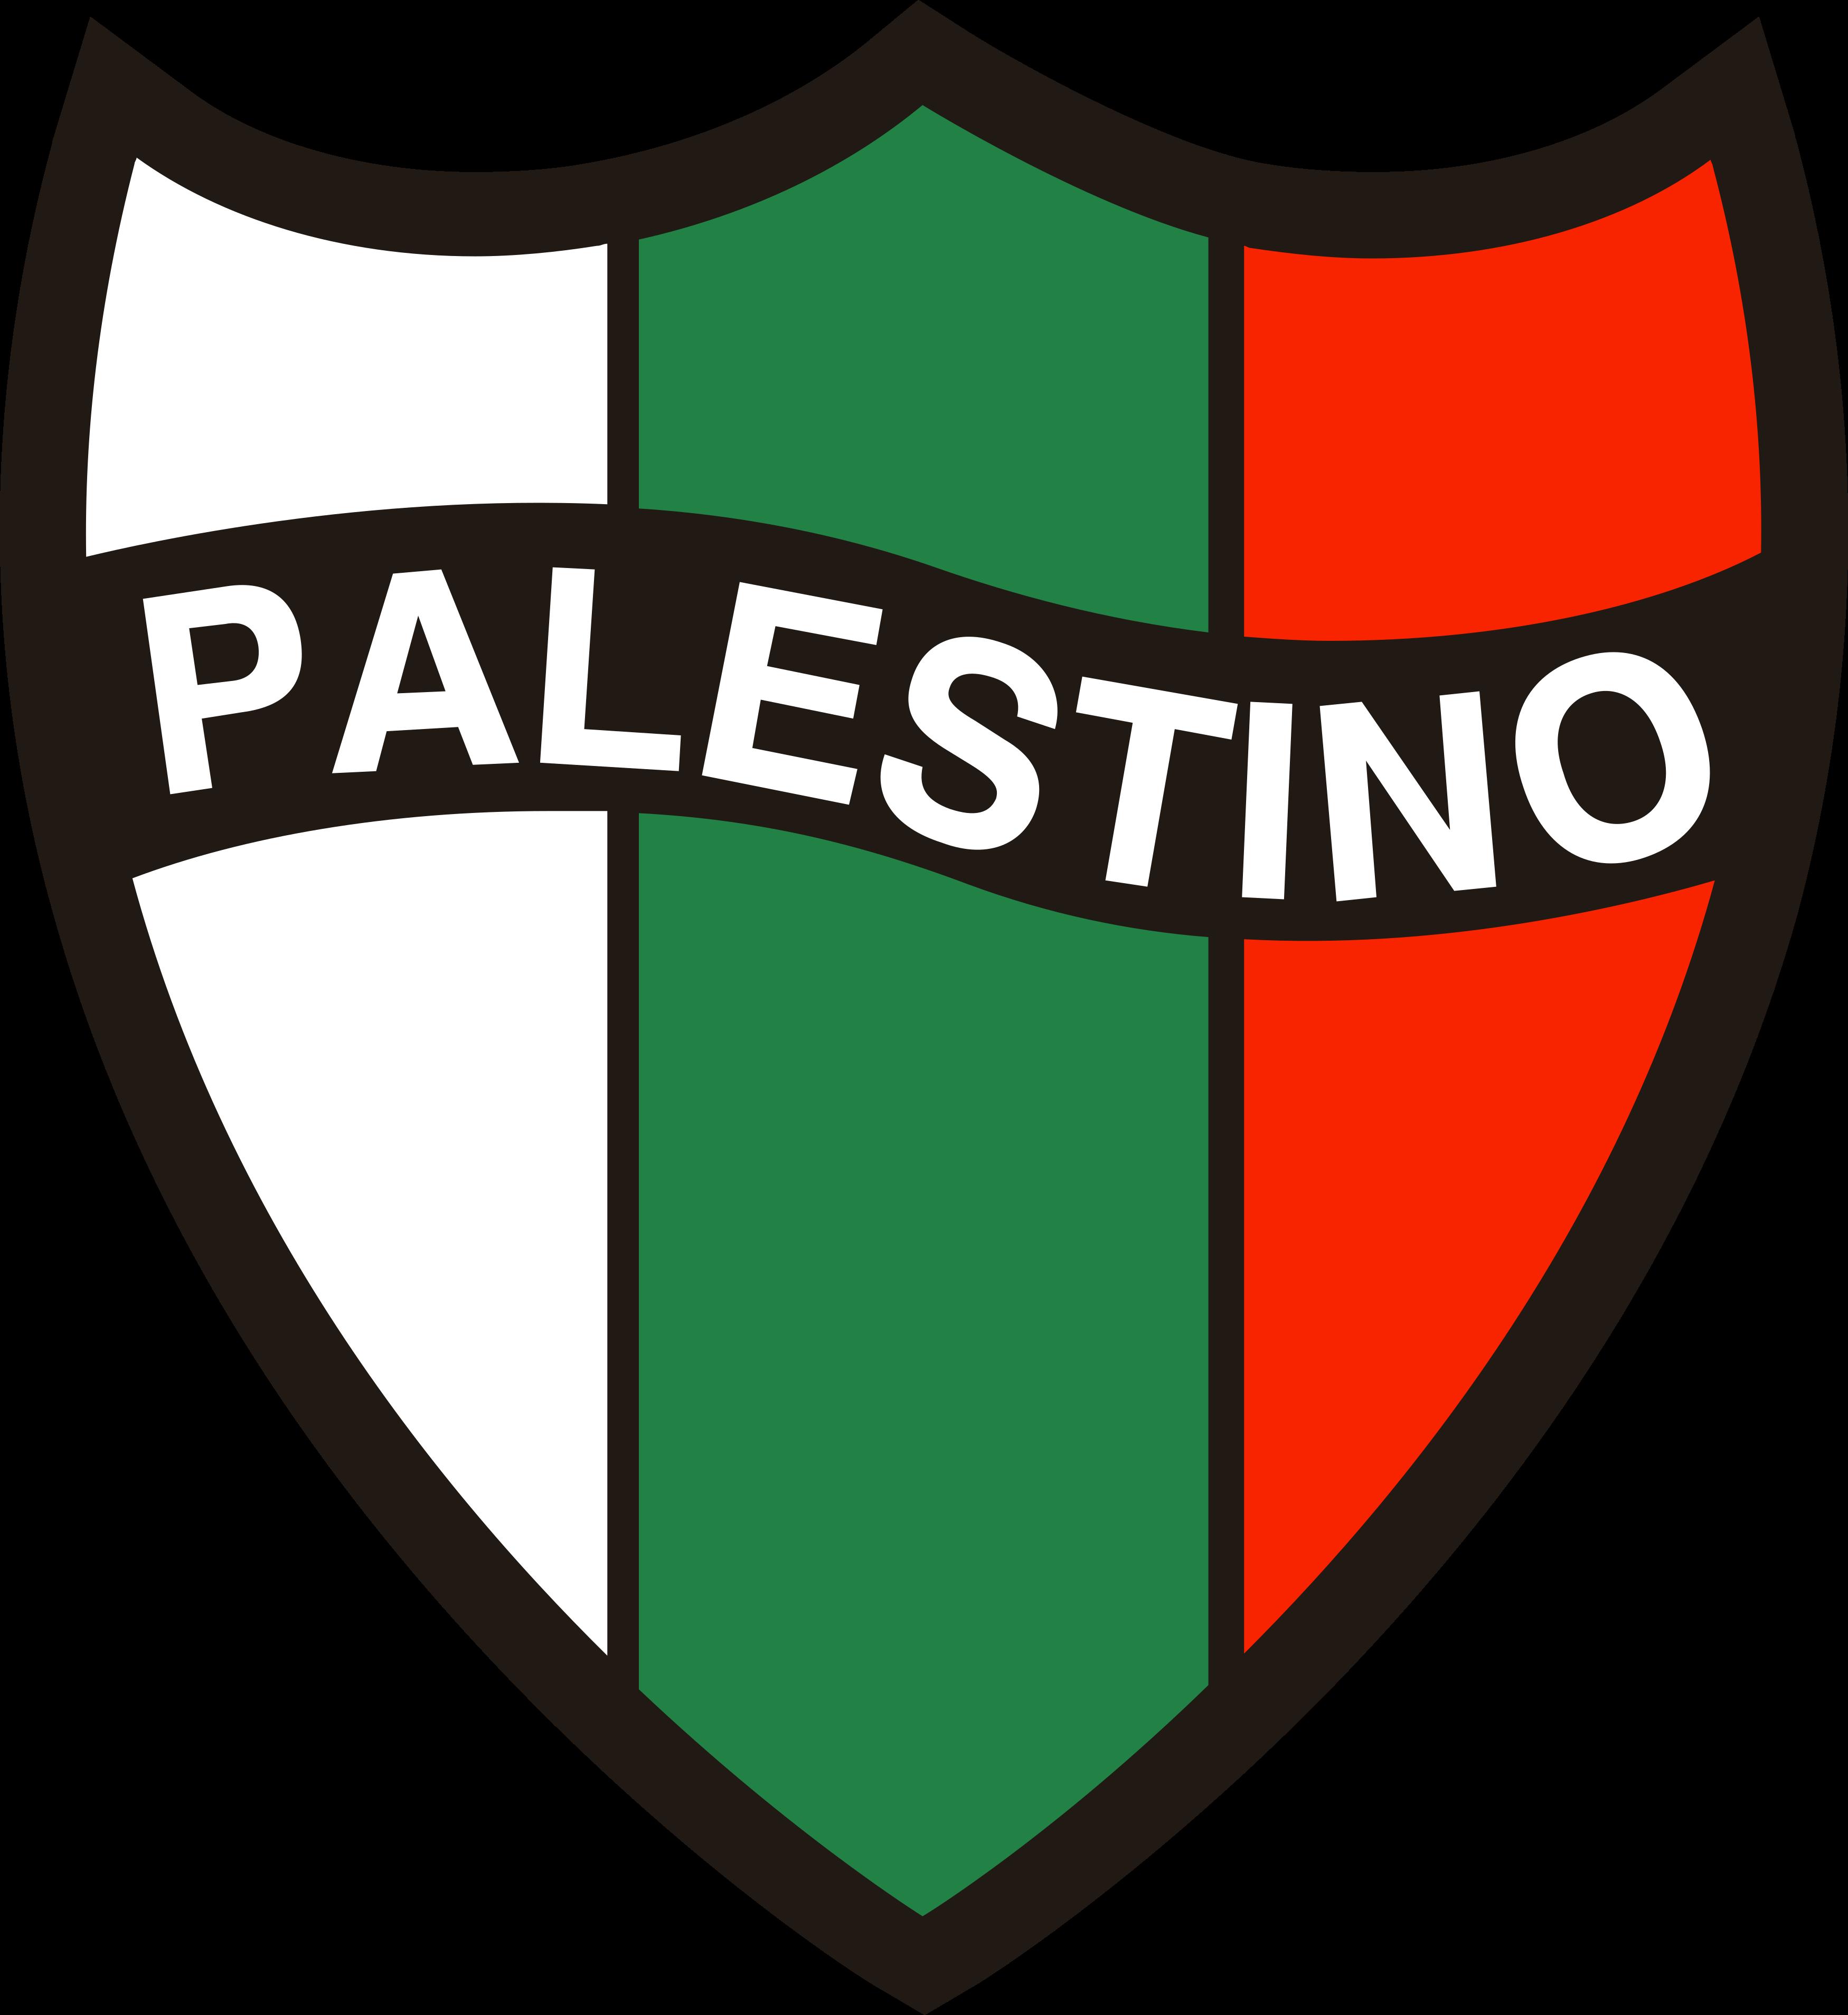 palestino-logo-escudo